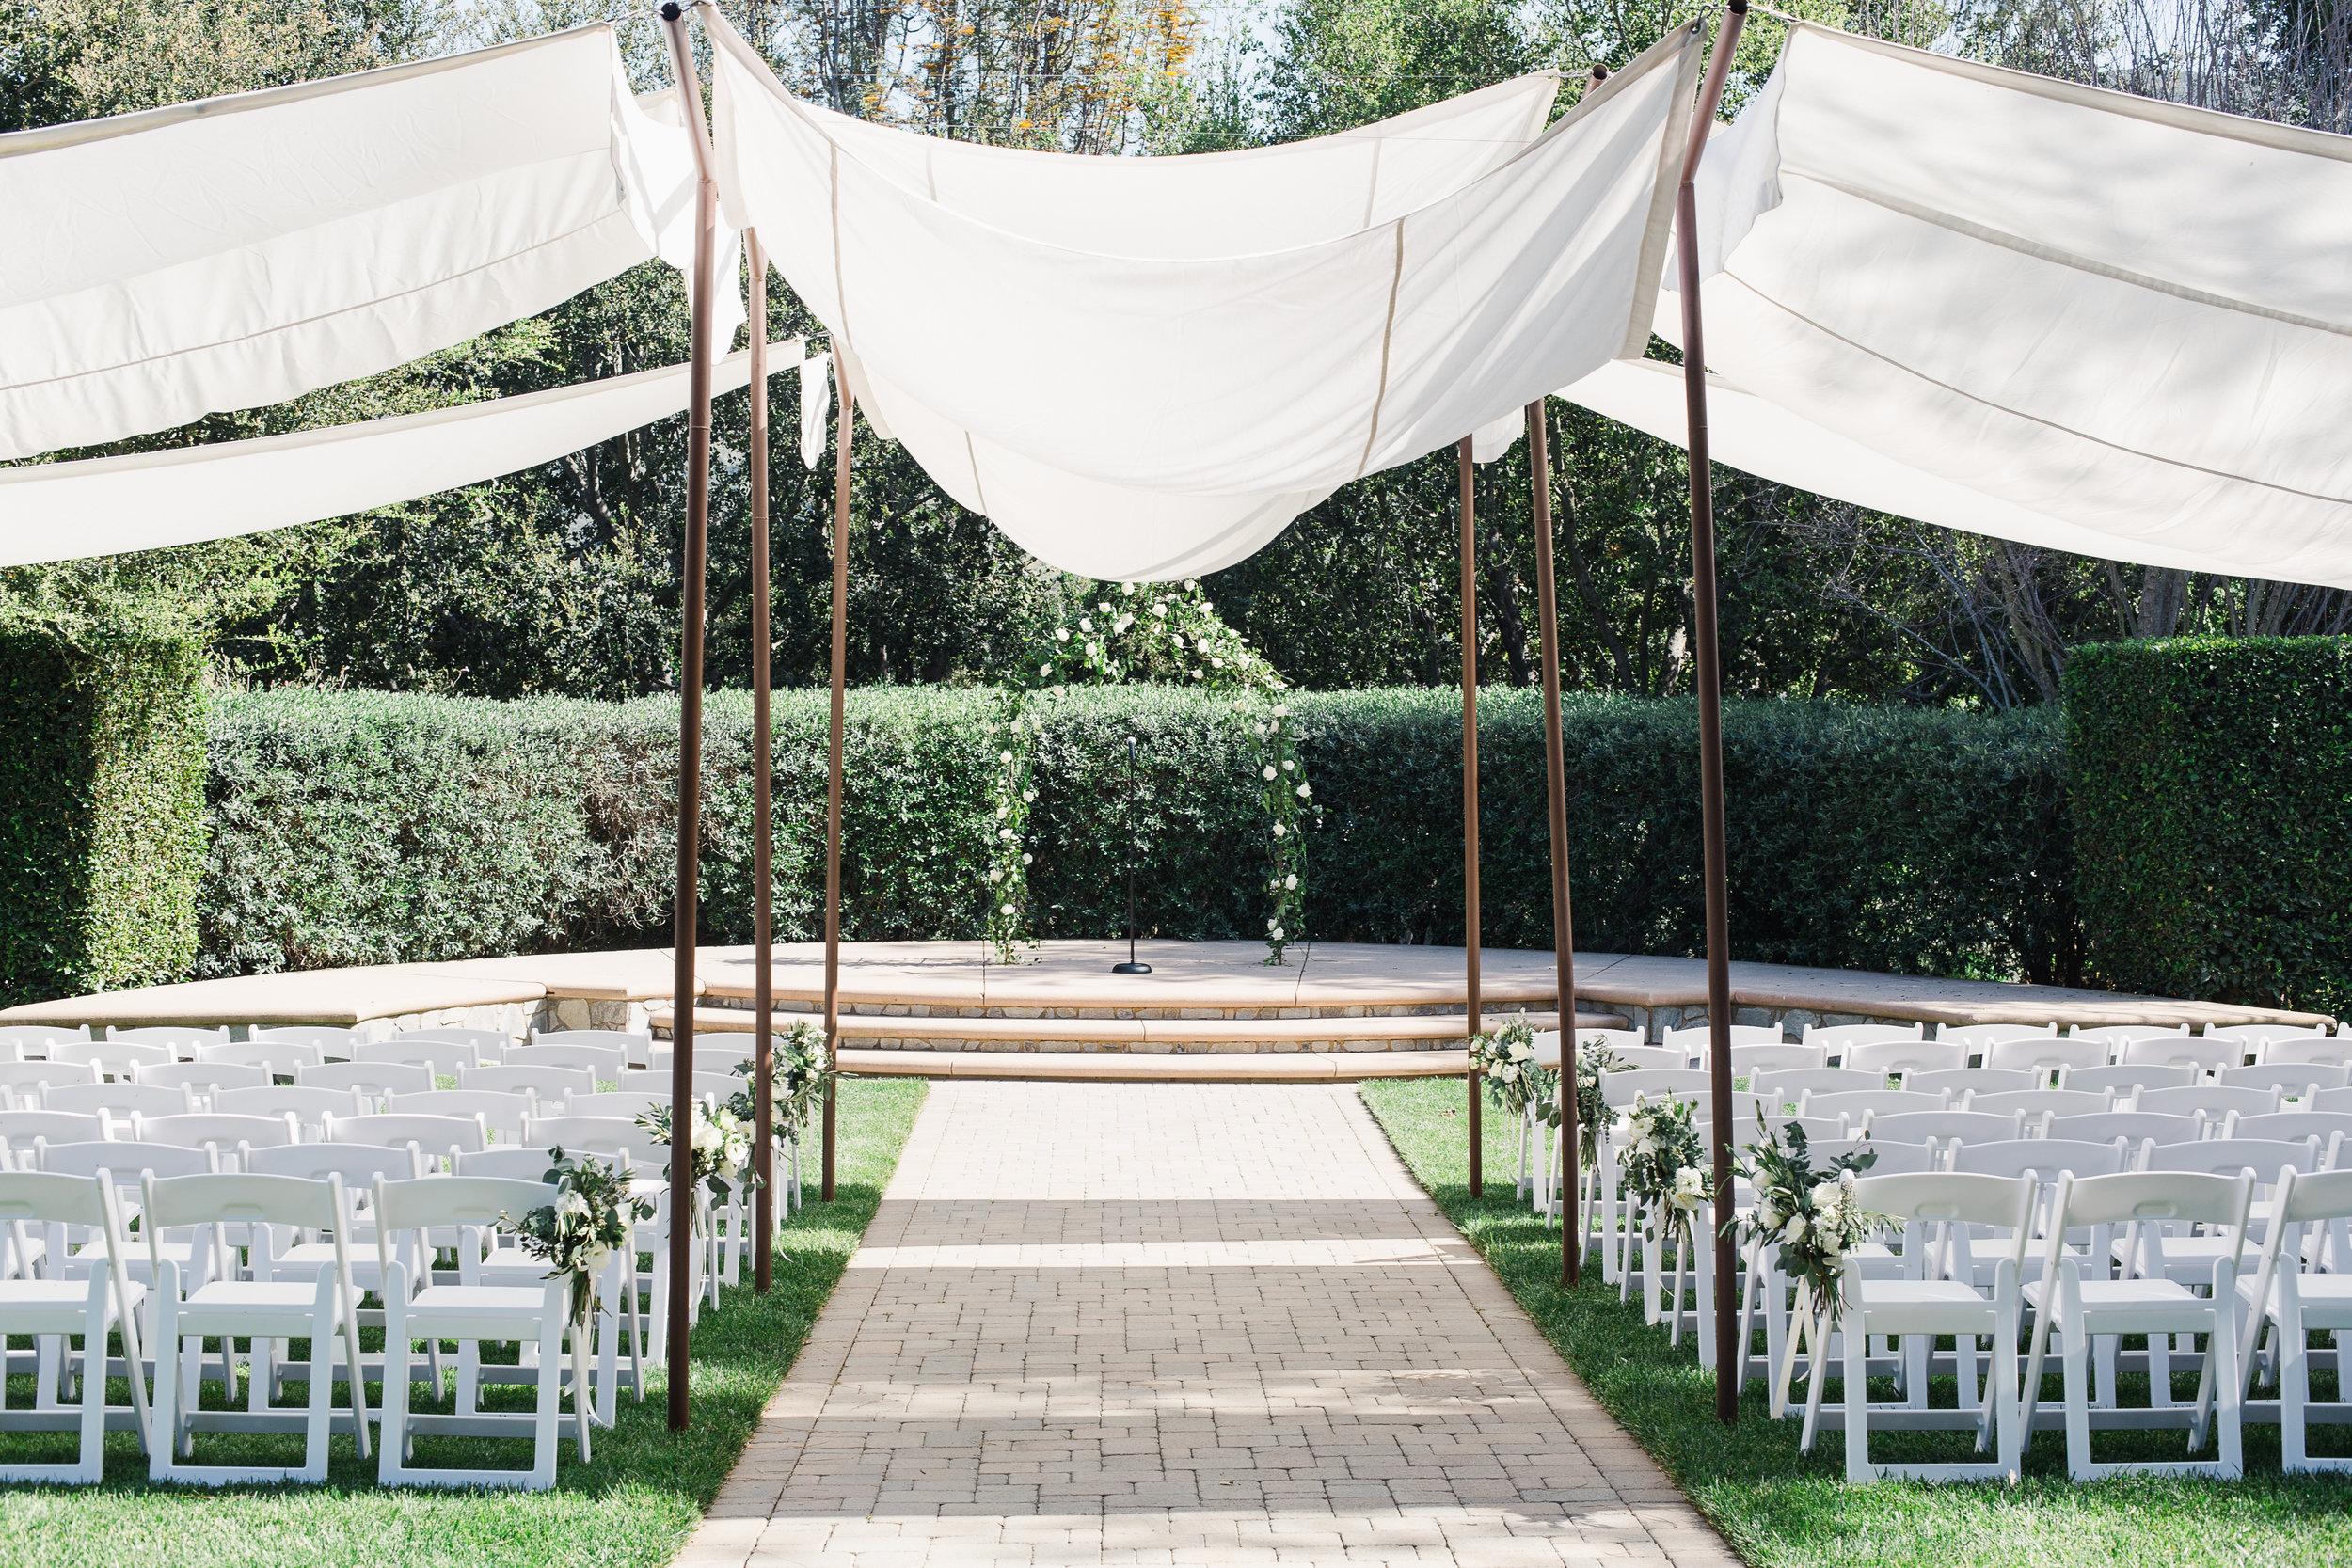 maravilla-gardens-camarillo-los-angeles-ca-california-wedding-pictures-pic0414.jpg